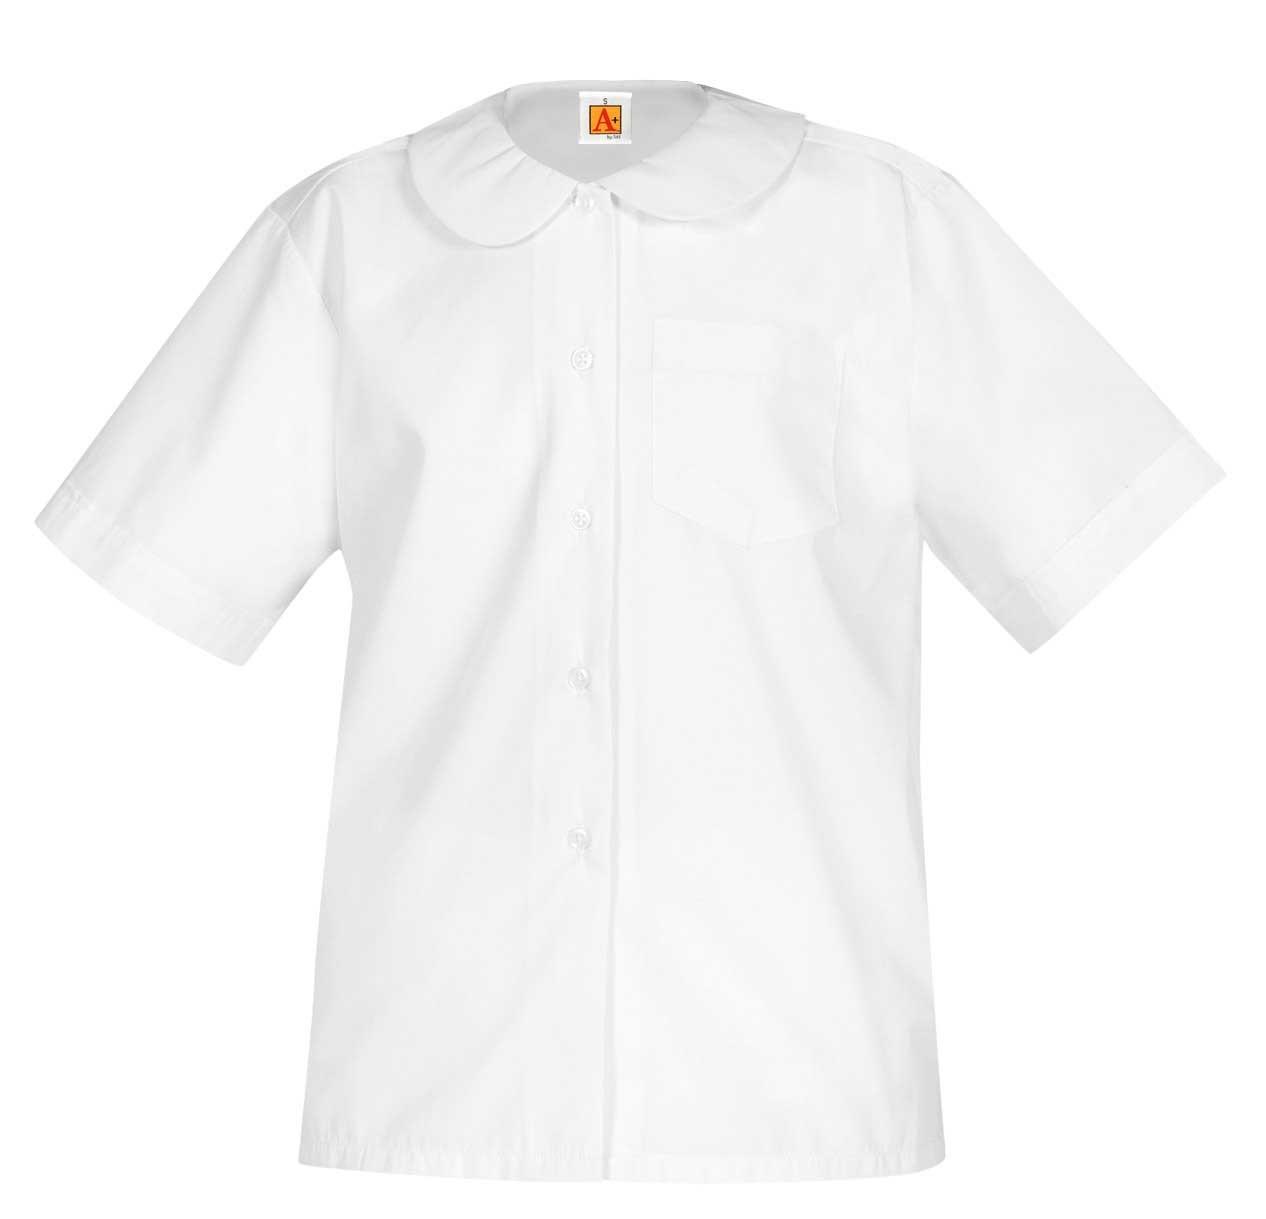 Peter Pan S/S Blouse w/ Pocket (9380) White